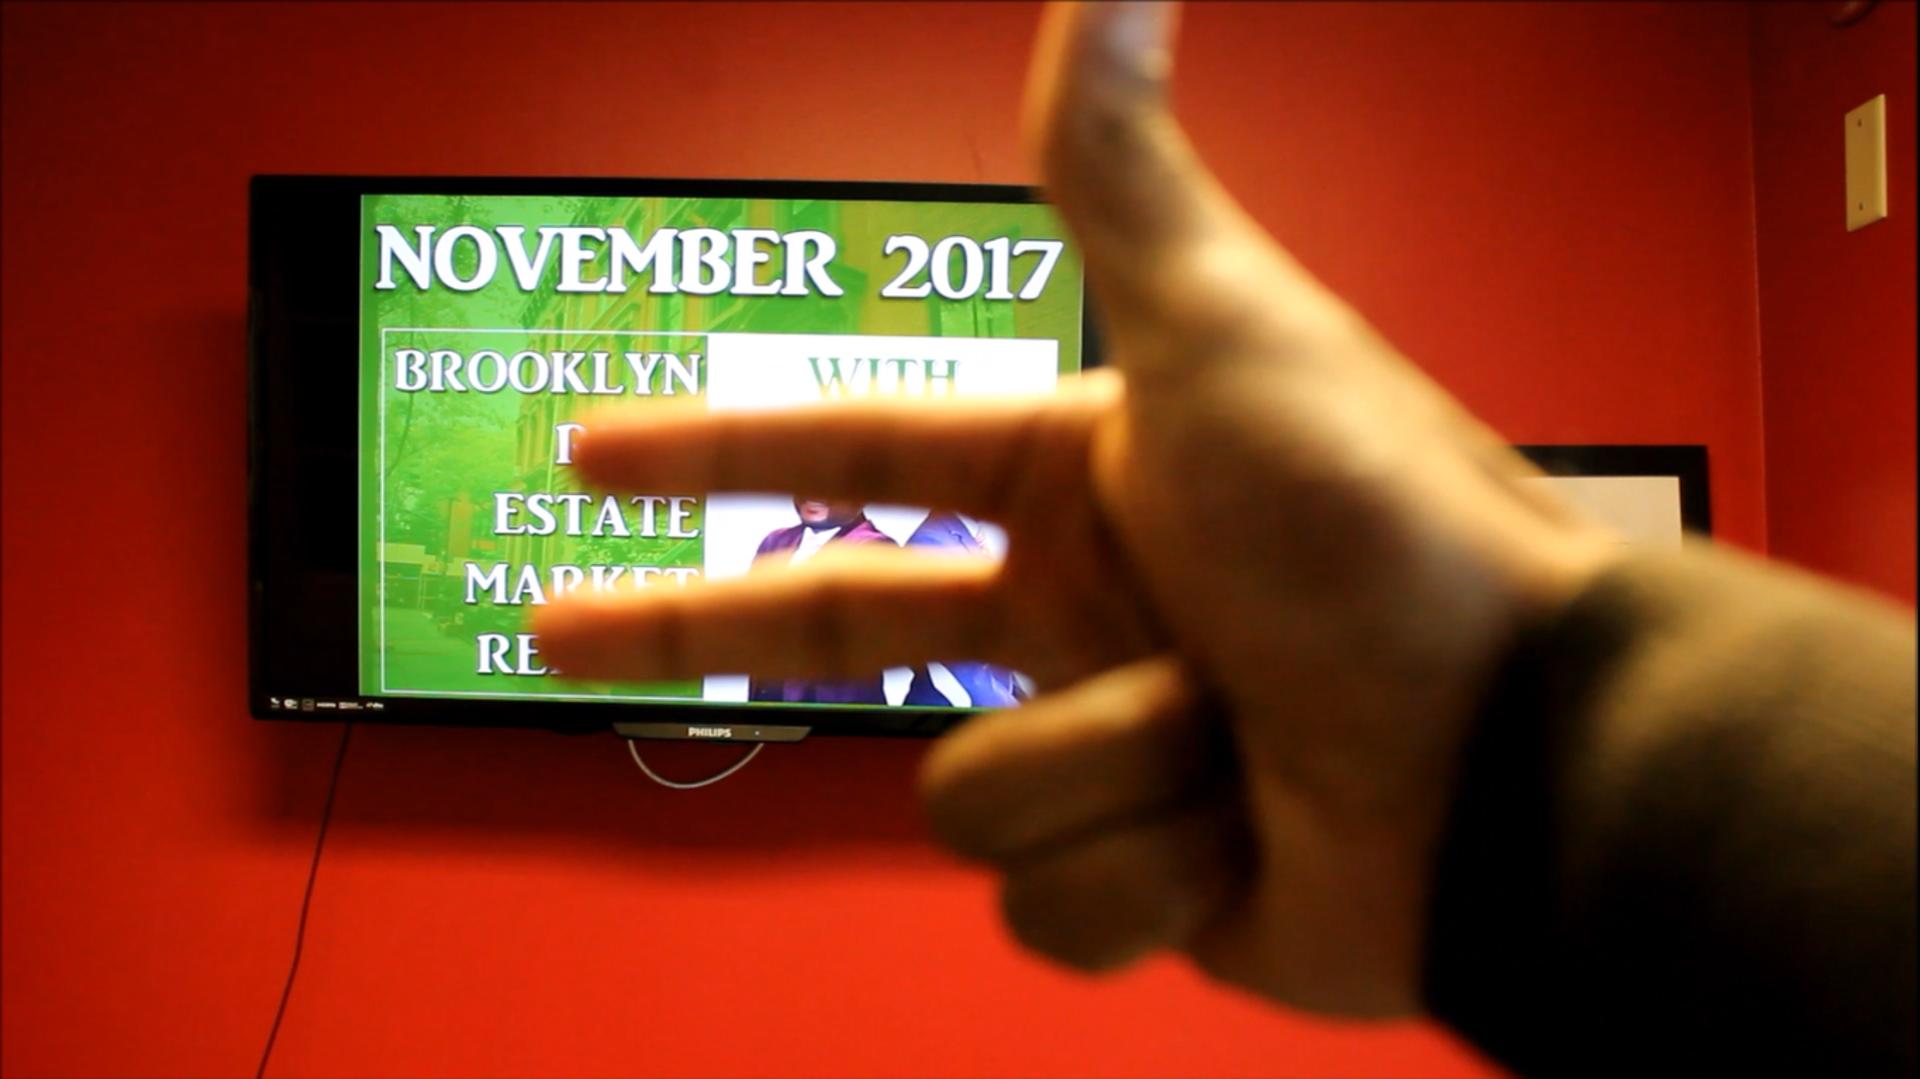 November 2017 Brooklyn Real Estate Market Report